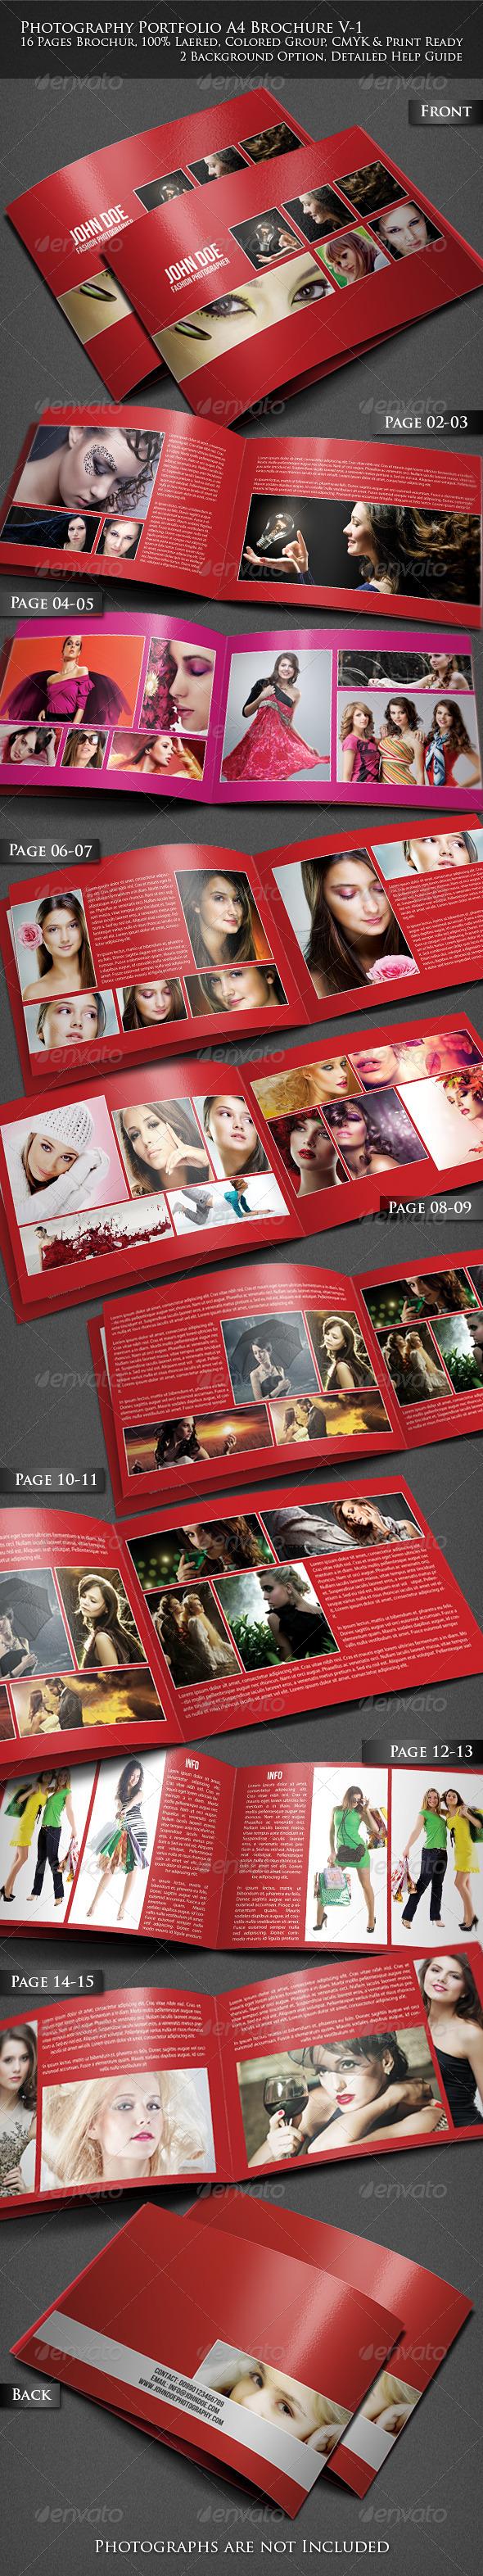 Photography Portfolio A4 Brochure - Portfolio Brochures